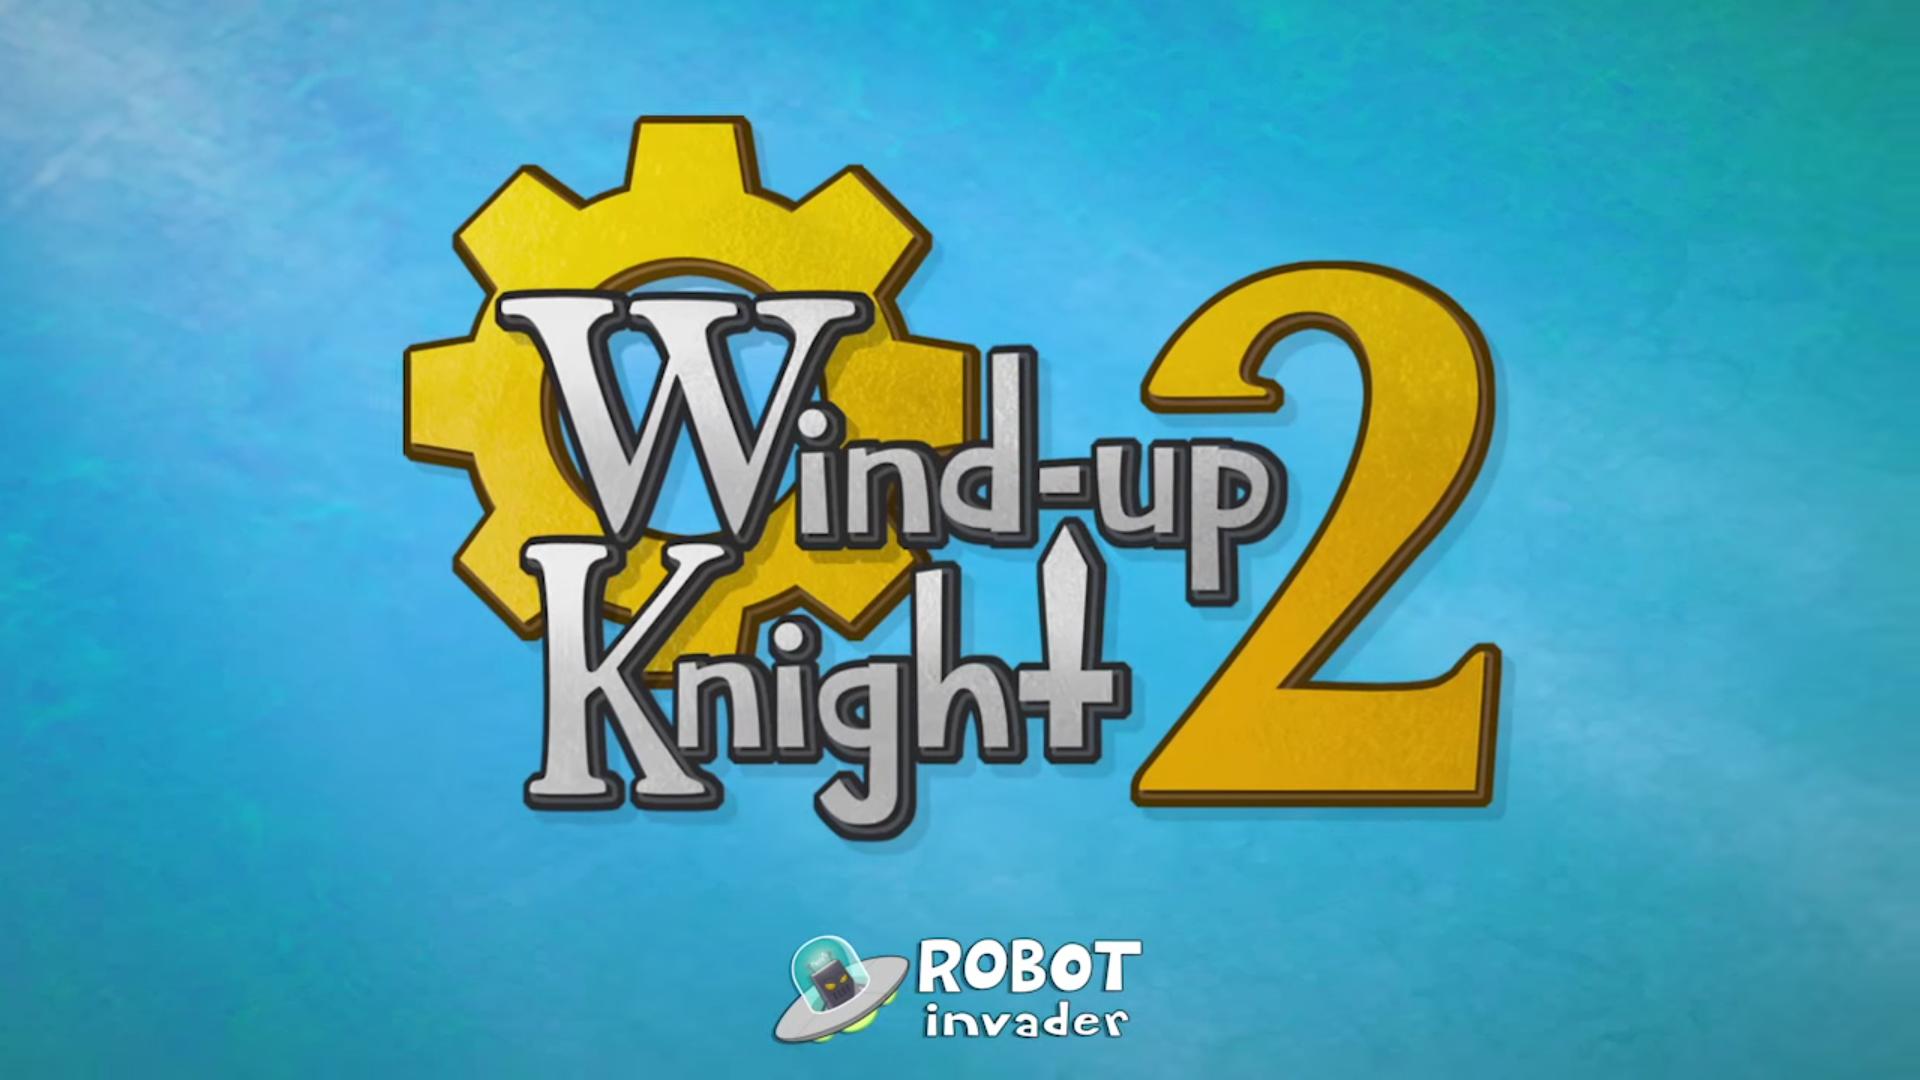 Wind Up Knight 2